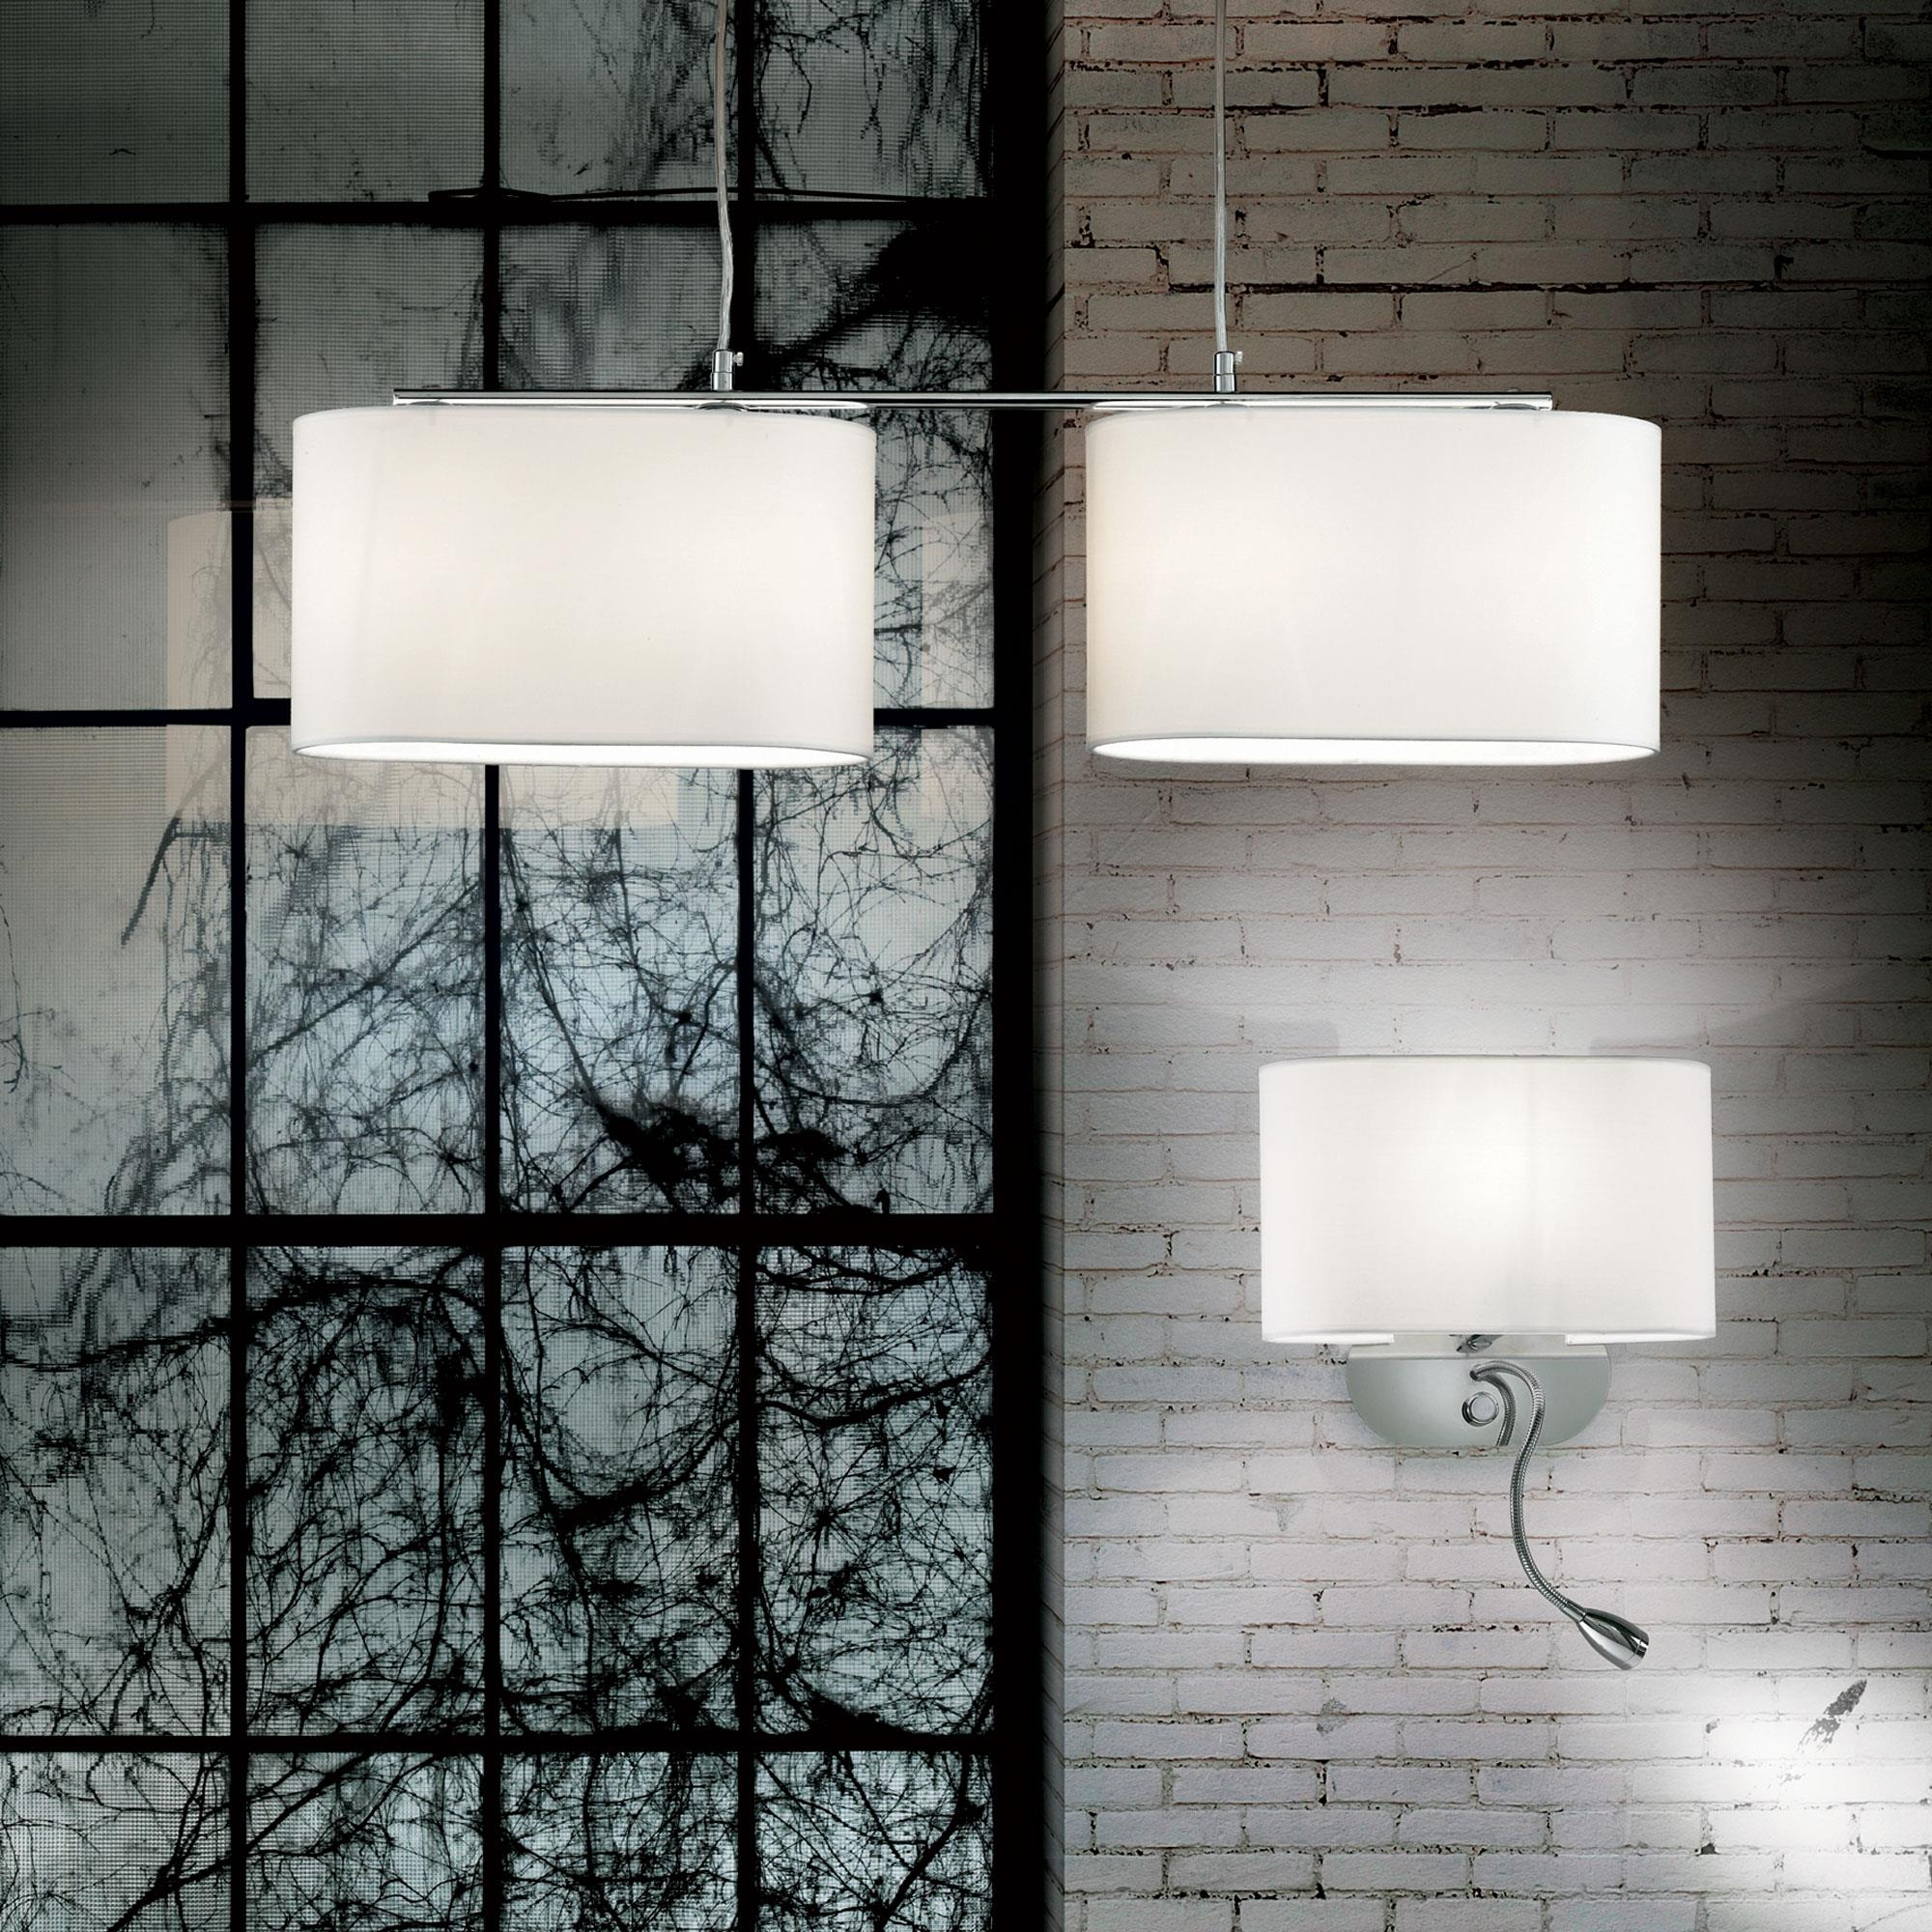 Ideal Lux 074900 Sheraton AP2 Bianco LED olvasókaros falilámpa